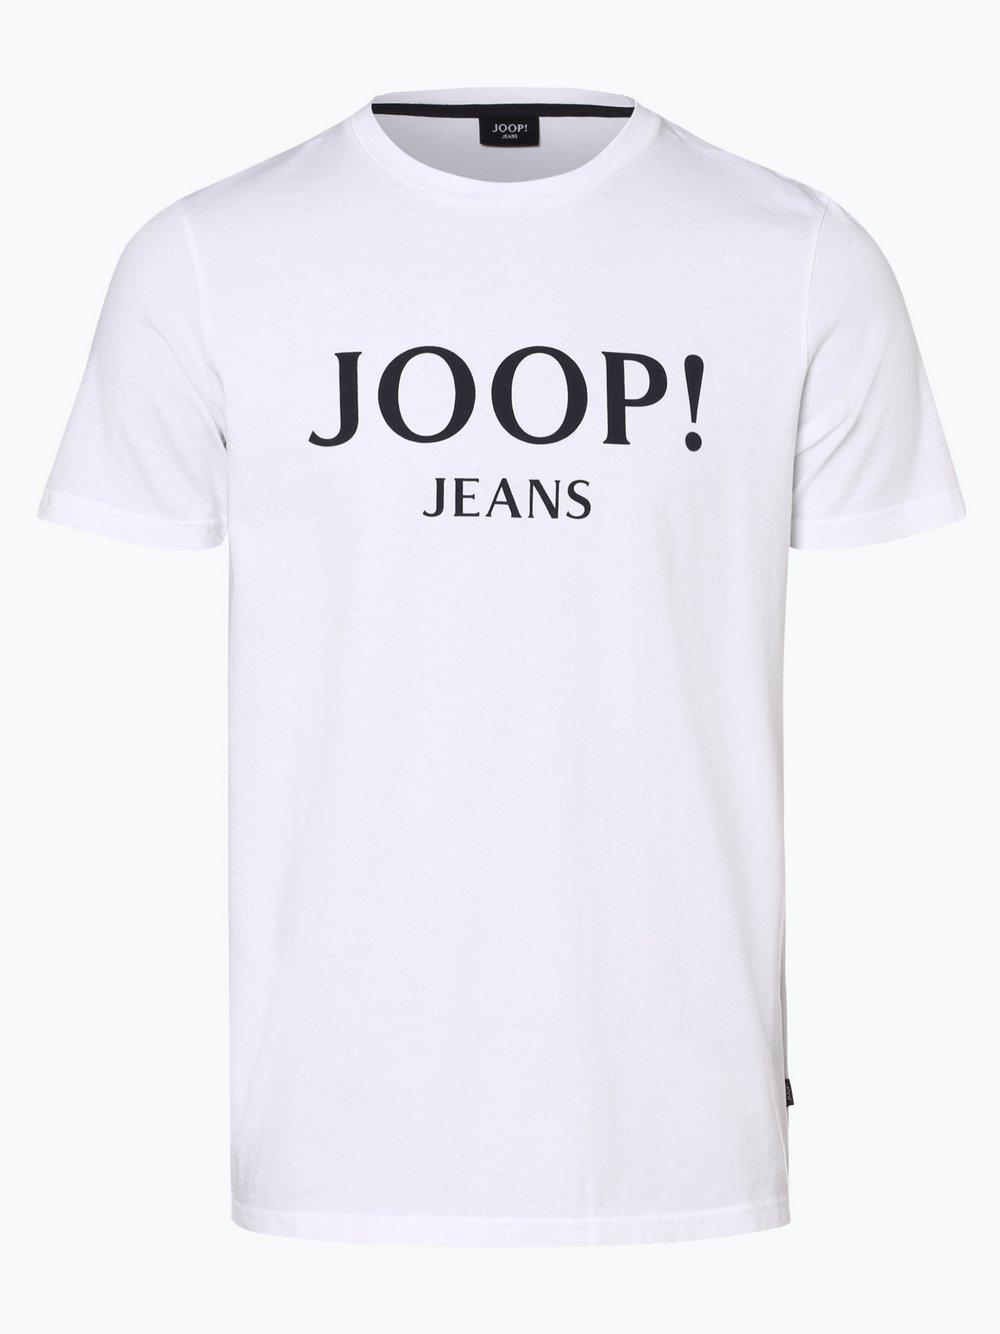 new product acfb9 e9c06 Herren T-Shirt - Alex